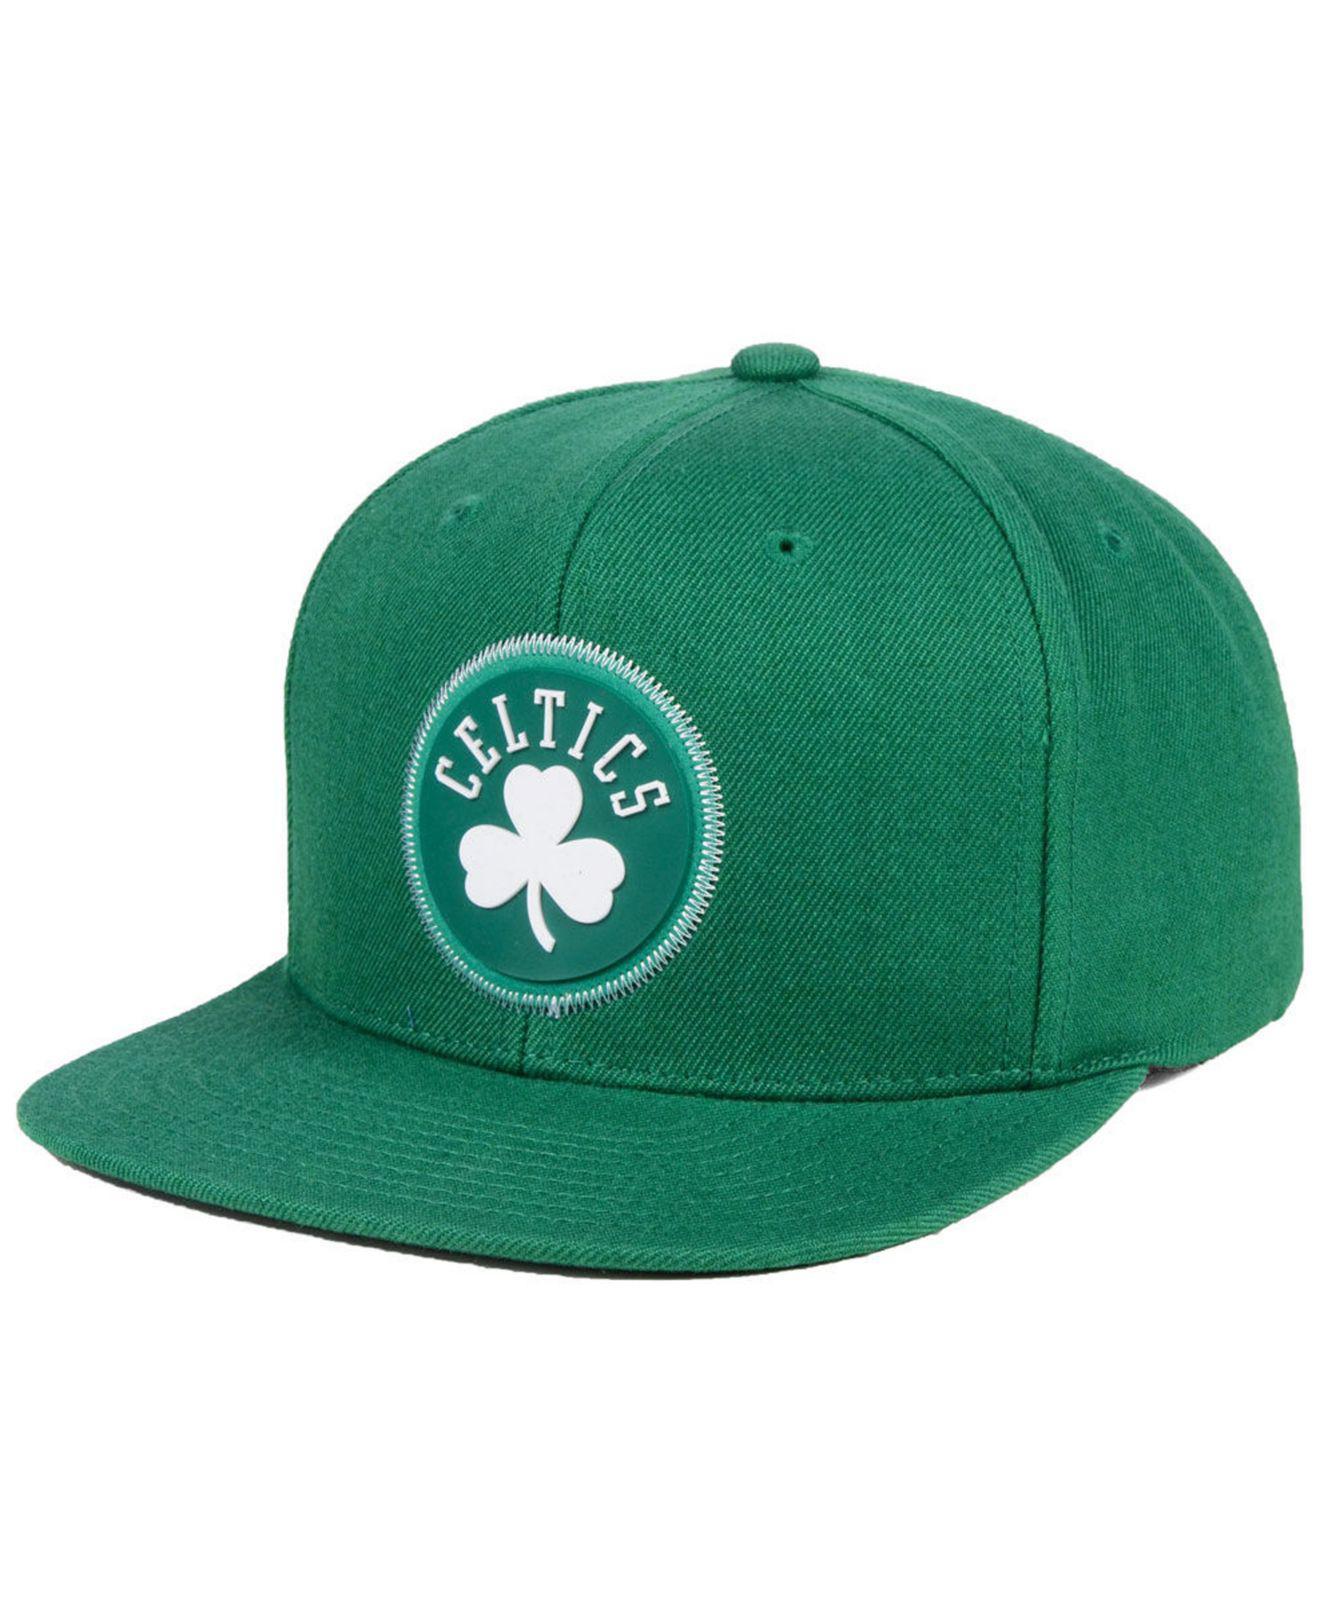 14d2b338a0a order mitchell ness. mens green boston celtics zig zag snapback cap 4d0a4  55f36